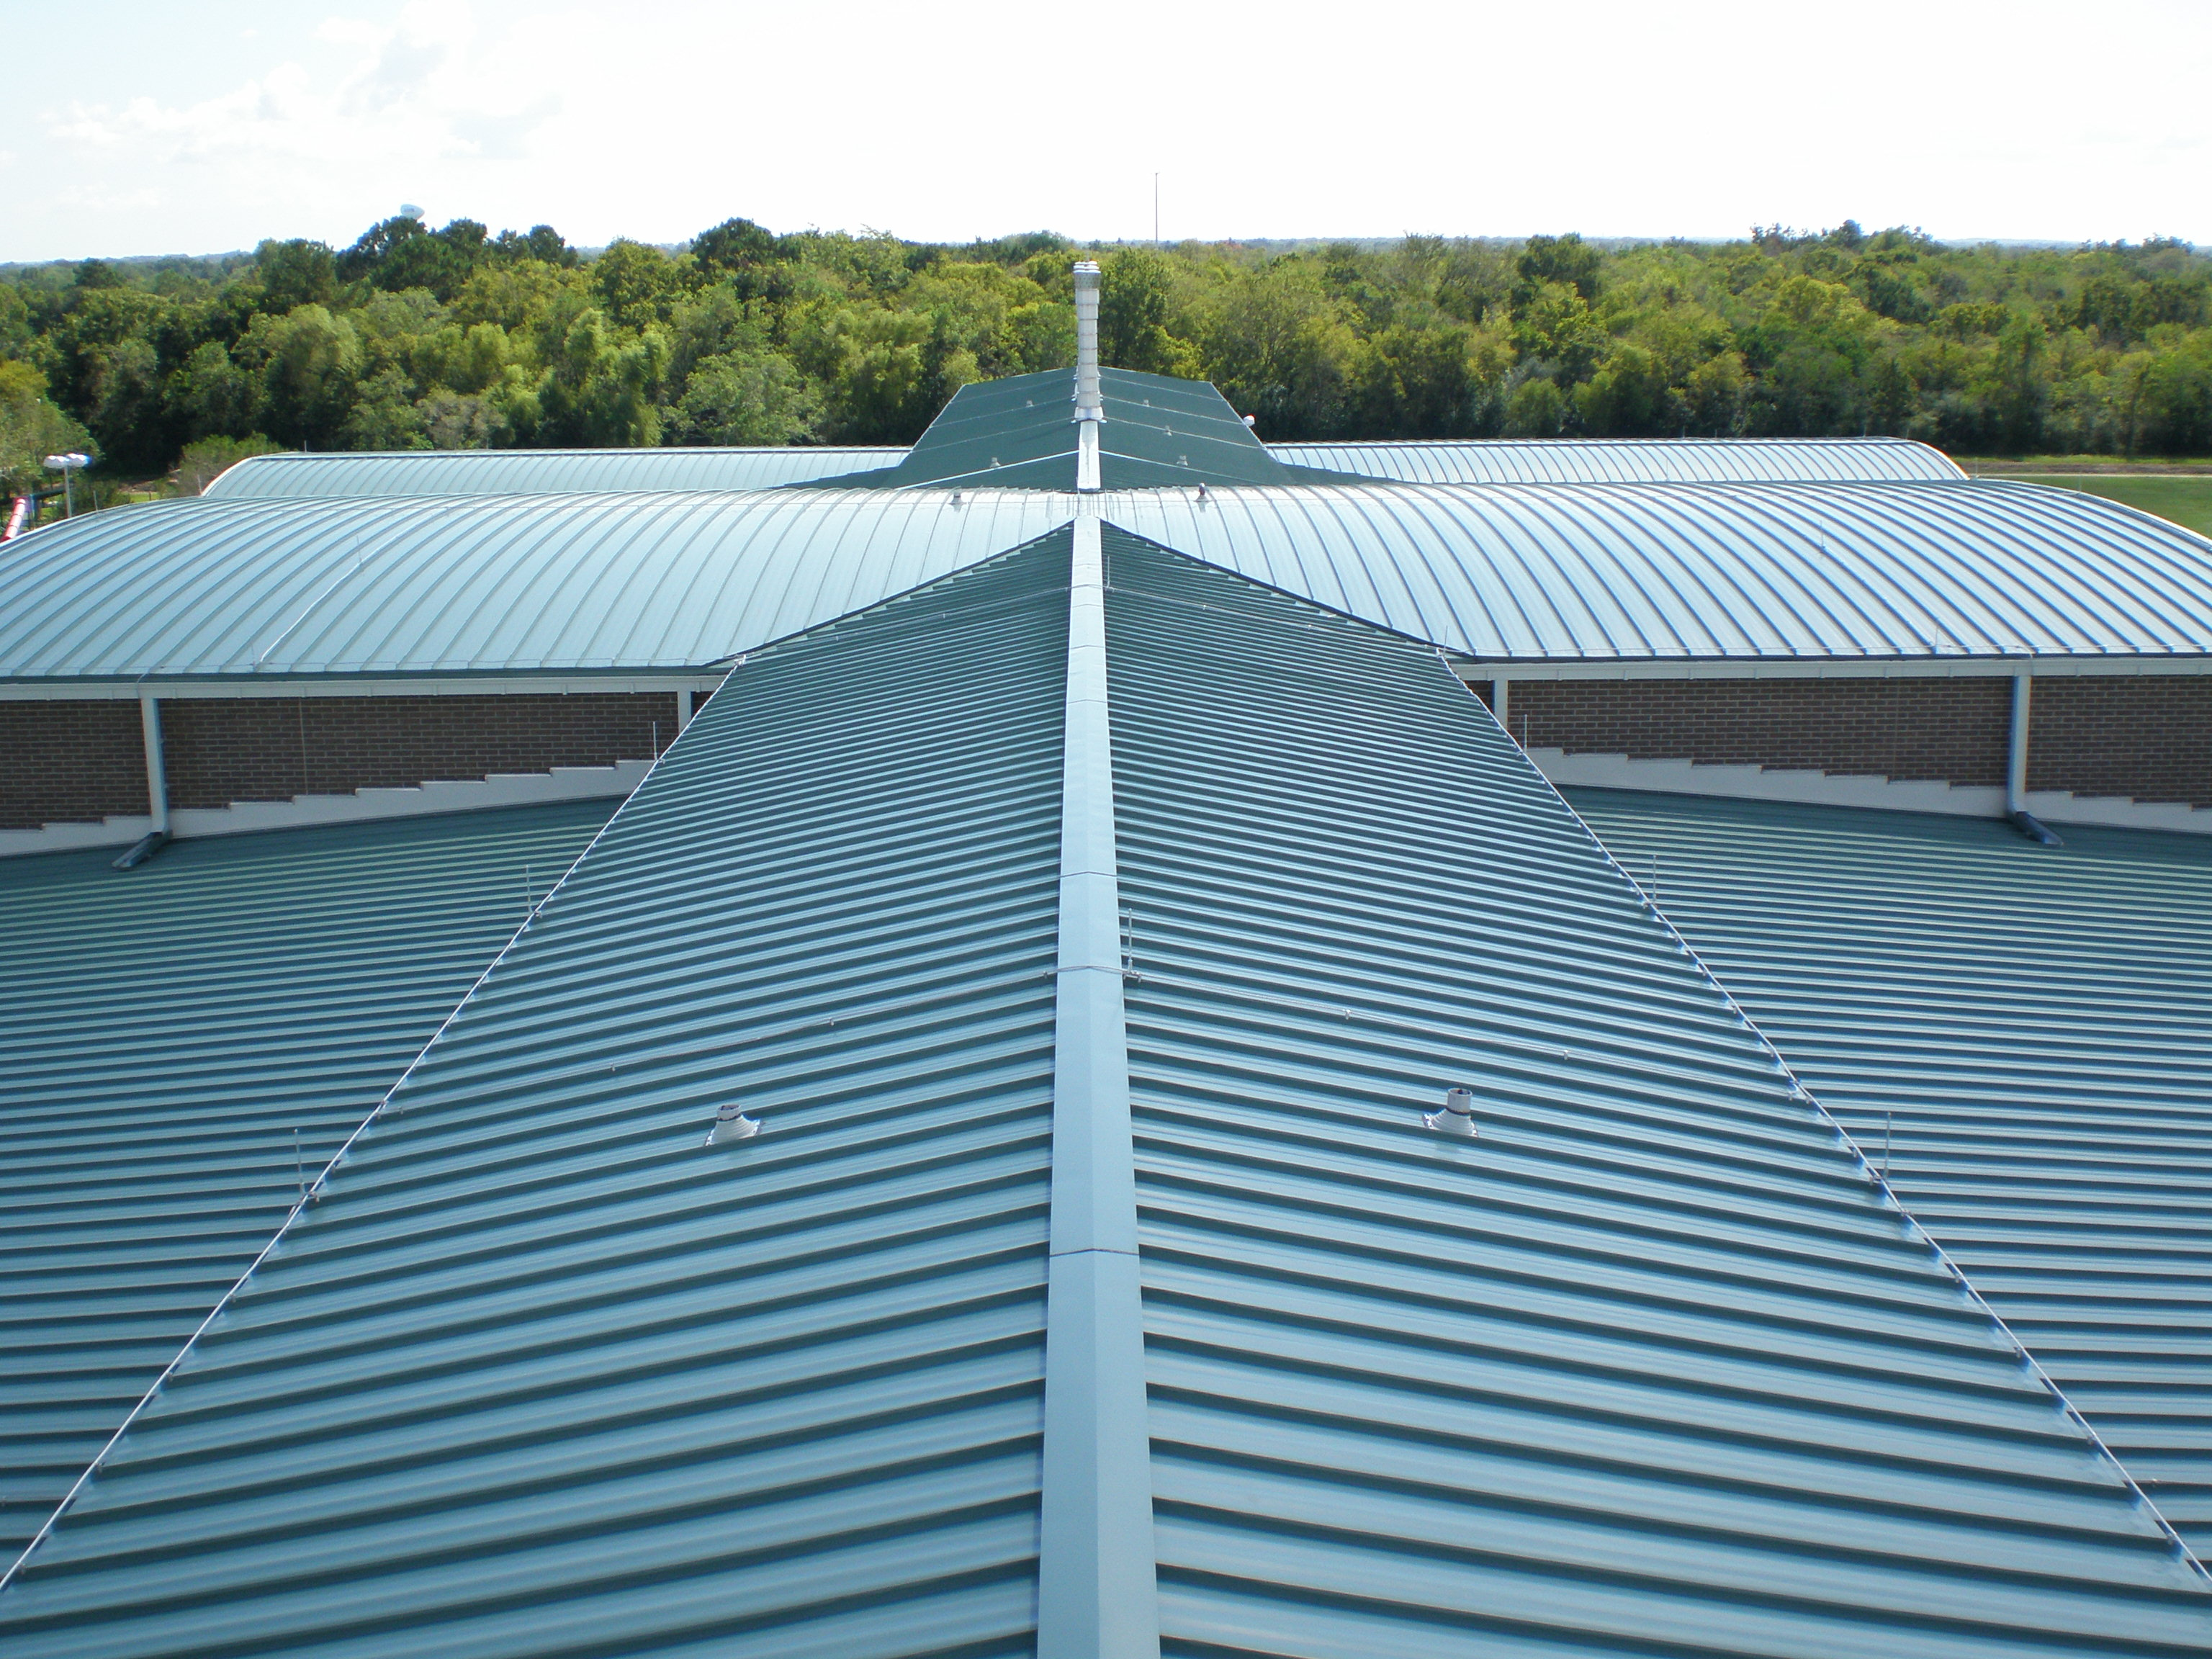 OLYMPUS DIGITAL CAMERA & Metal Roof - Calebs Management memphite.com